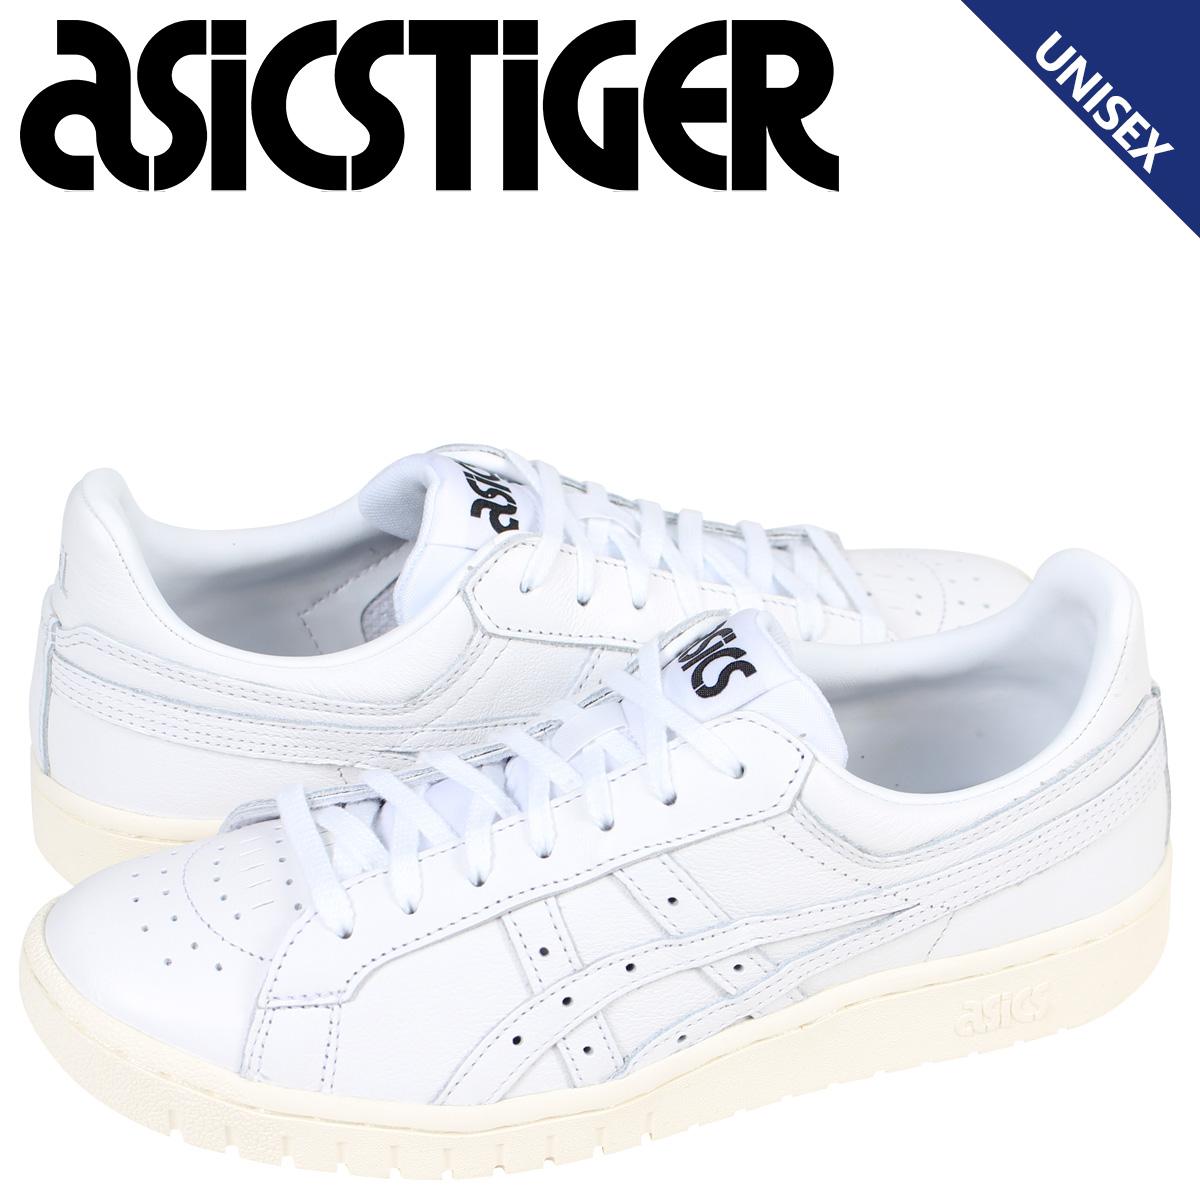 the latest 3fe75 2e583 asics Tiger ASICS tiger gel PTG sneakers GEL point man HL7X0-0101 men white  white [the 8/15 additional arrival]